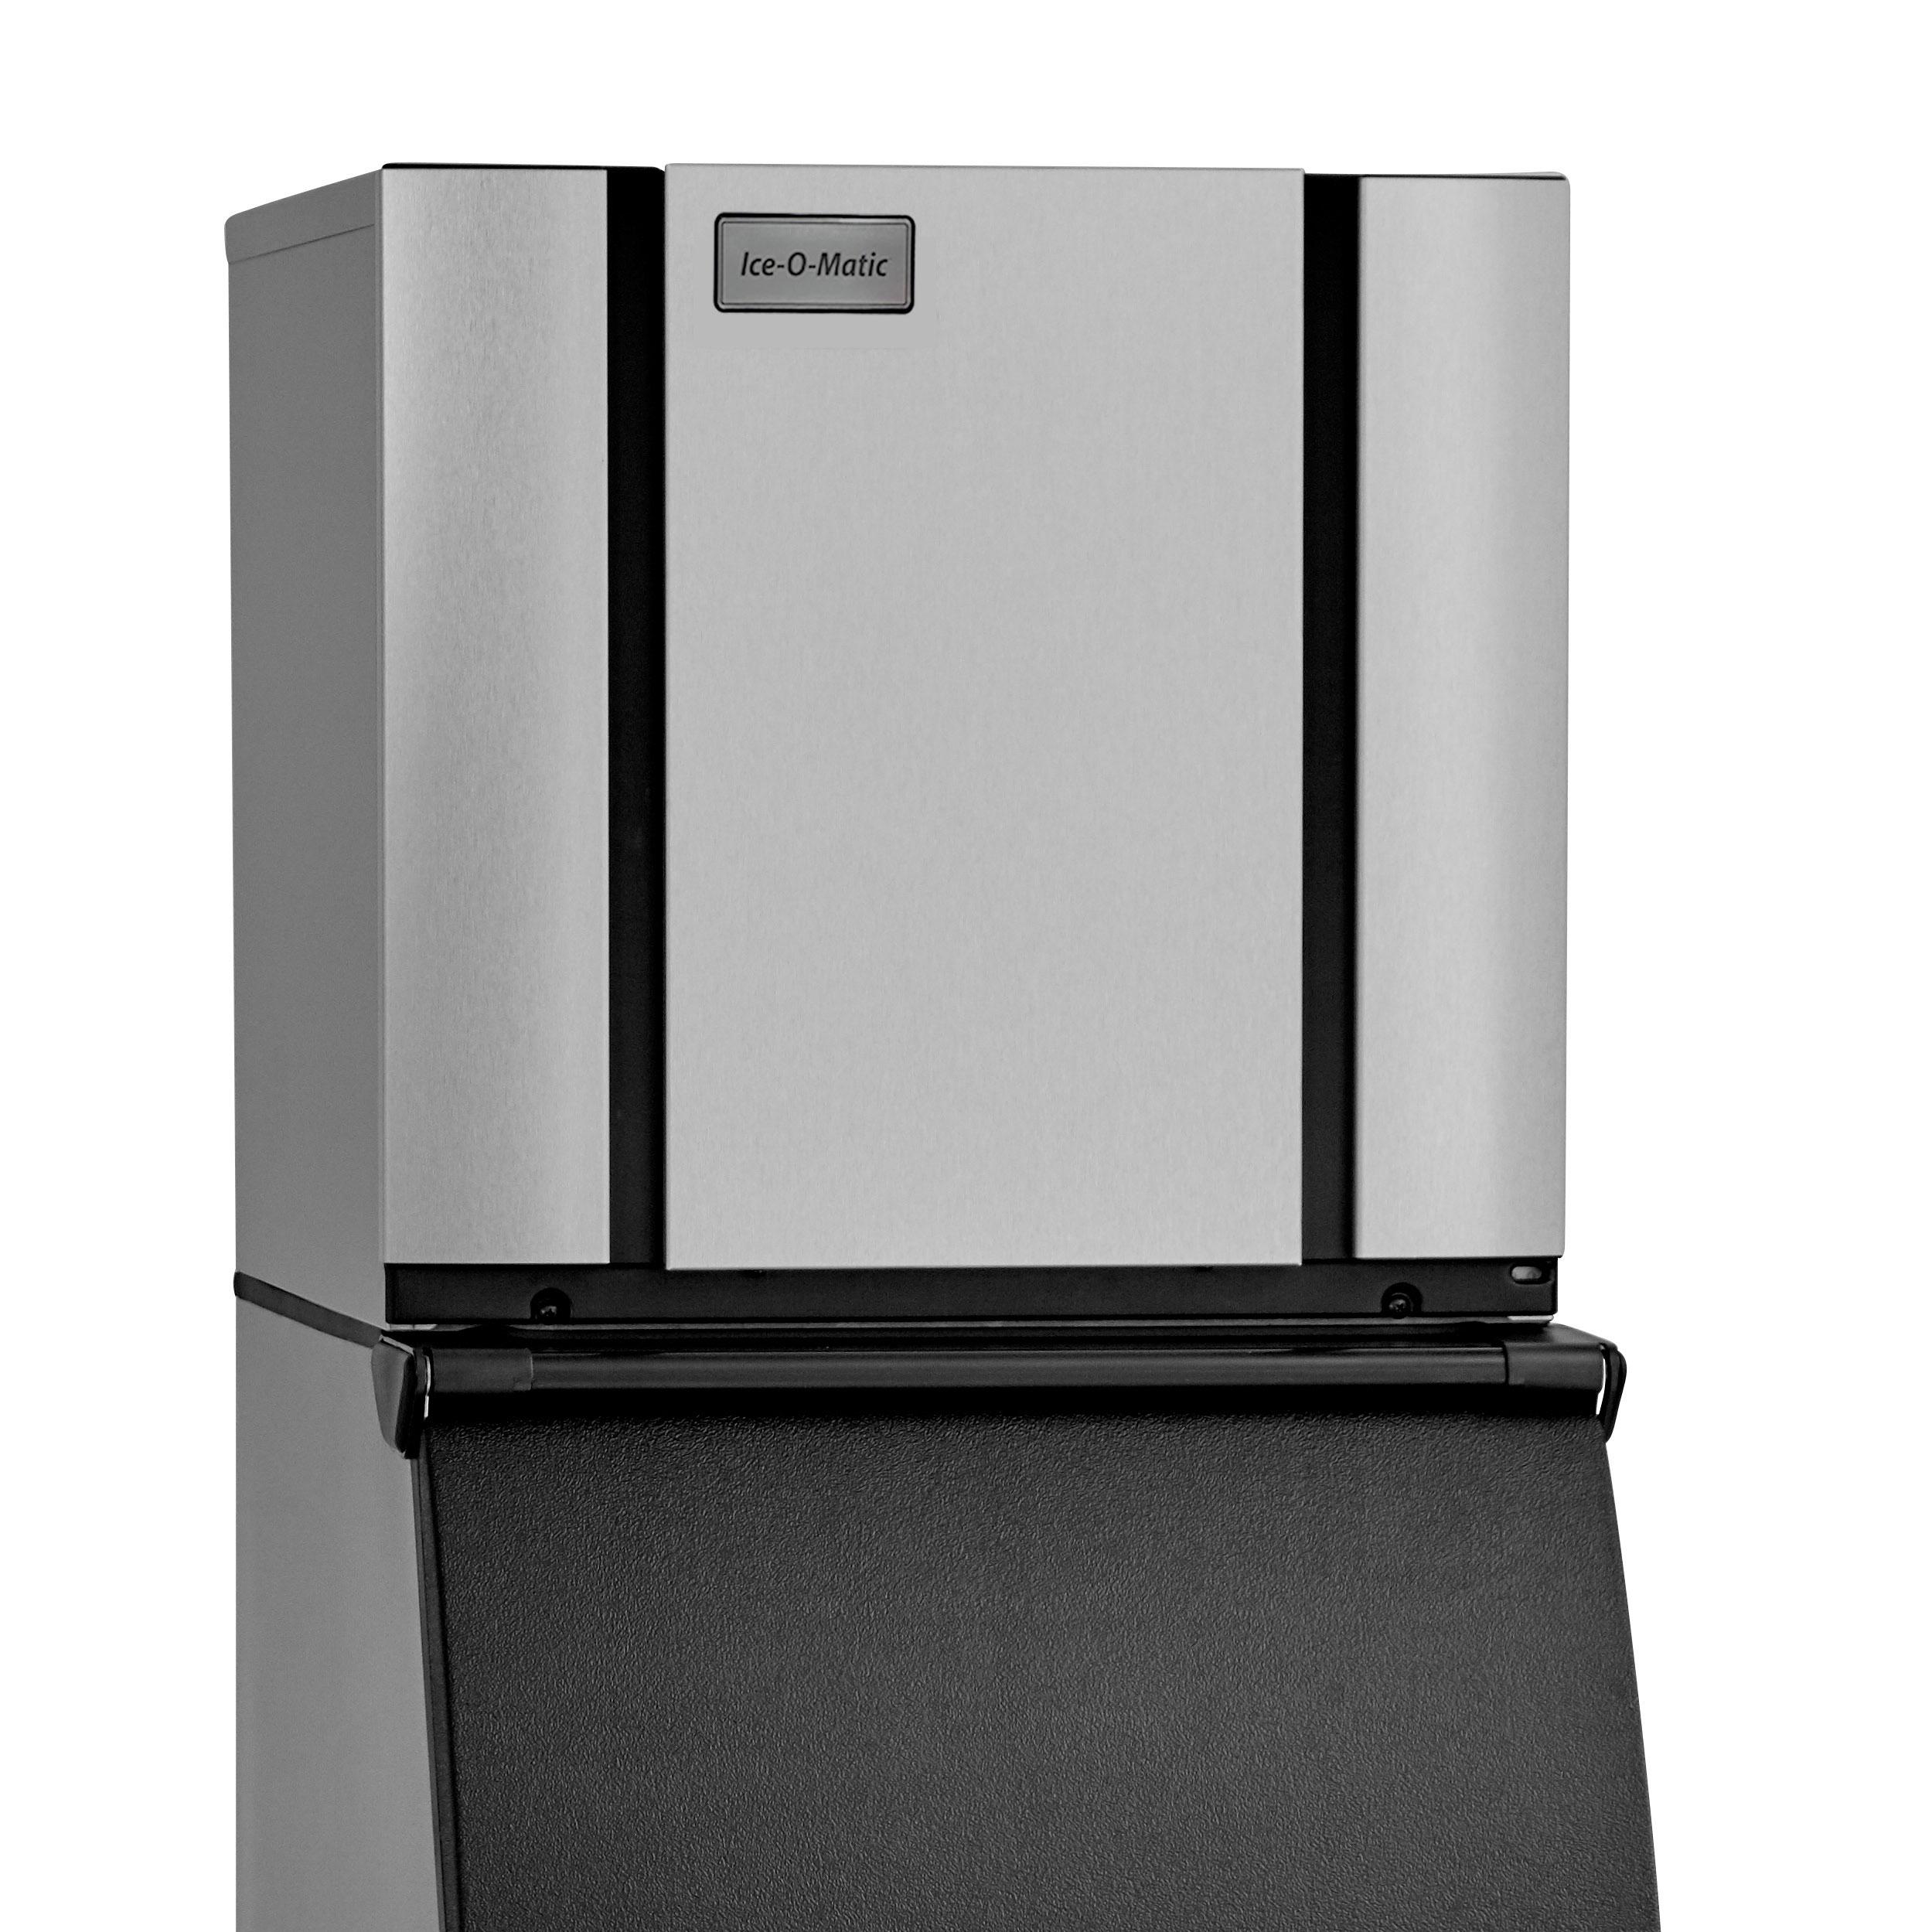 Ice-O-Matic CIM0520HA ice maker, cube-style